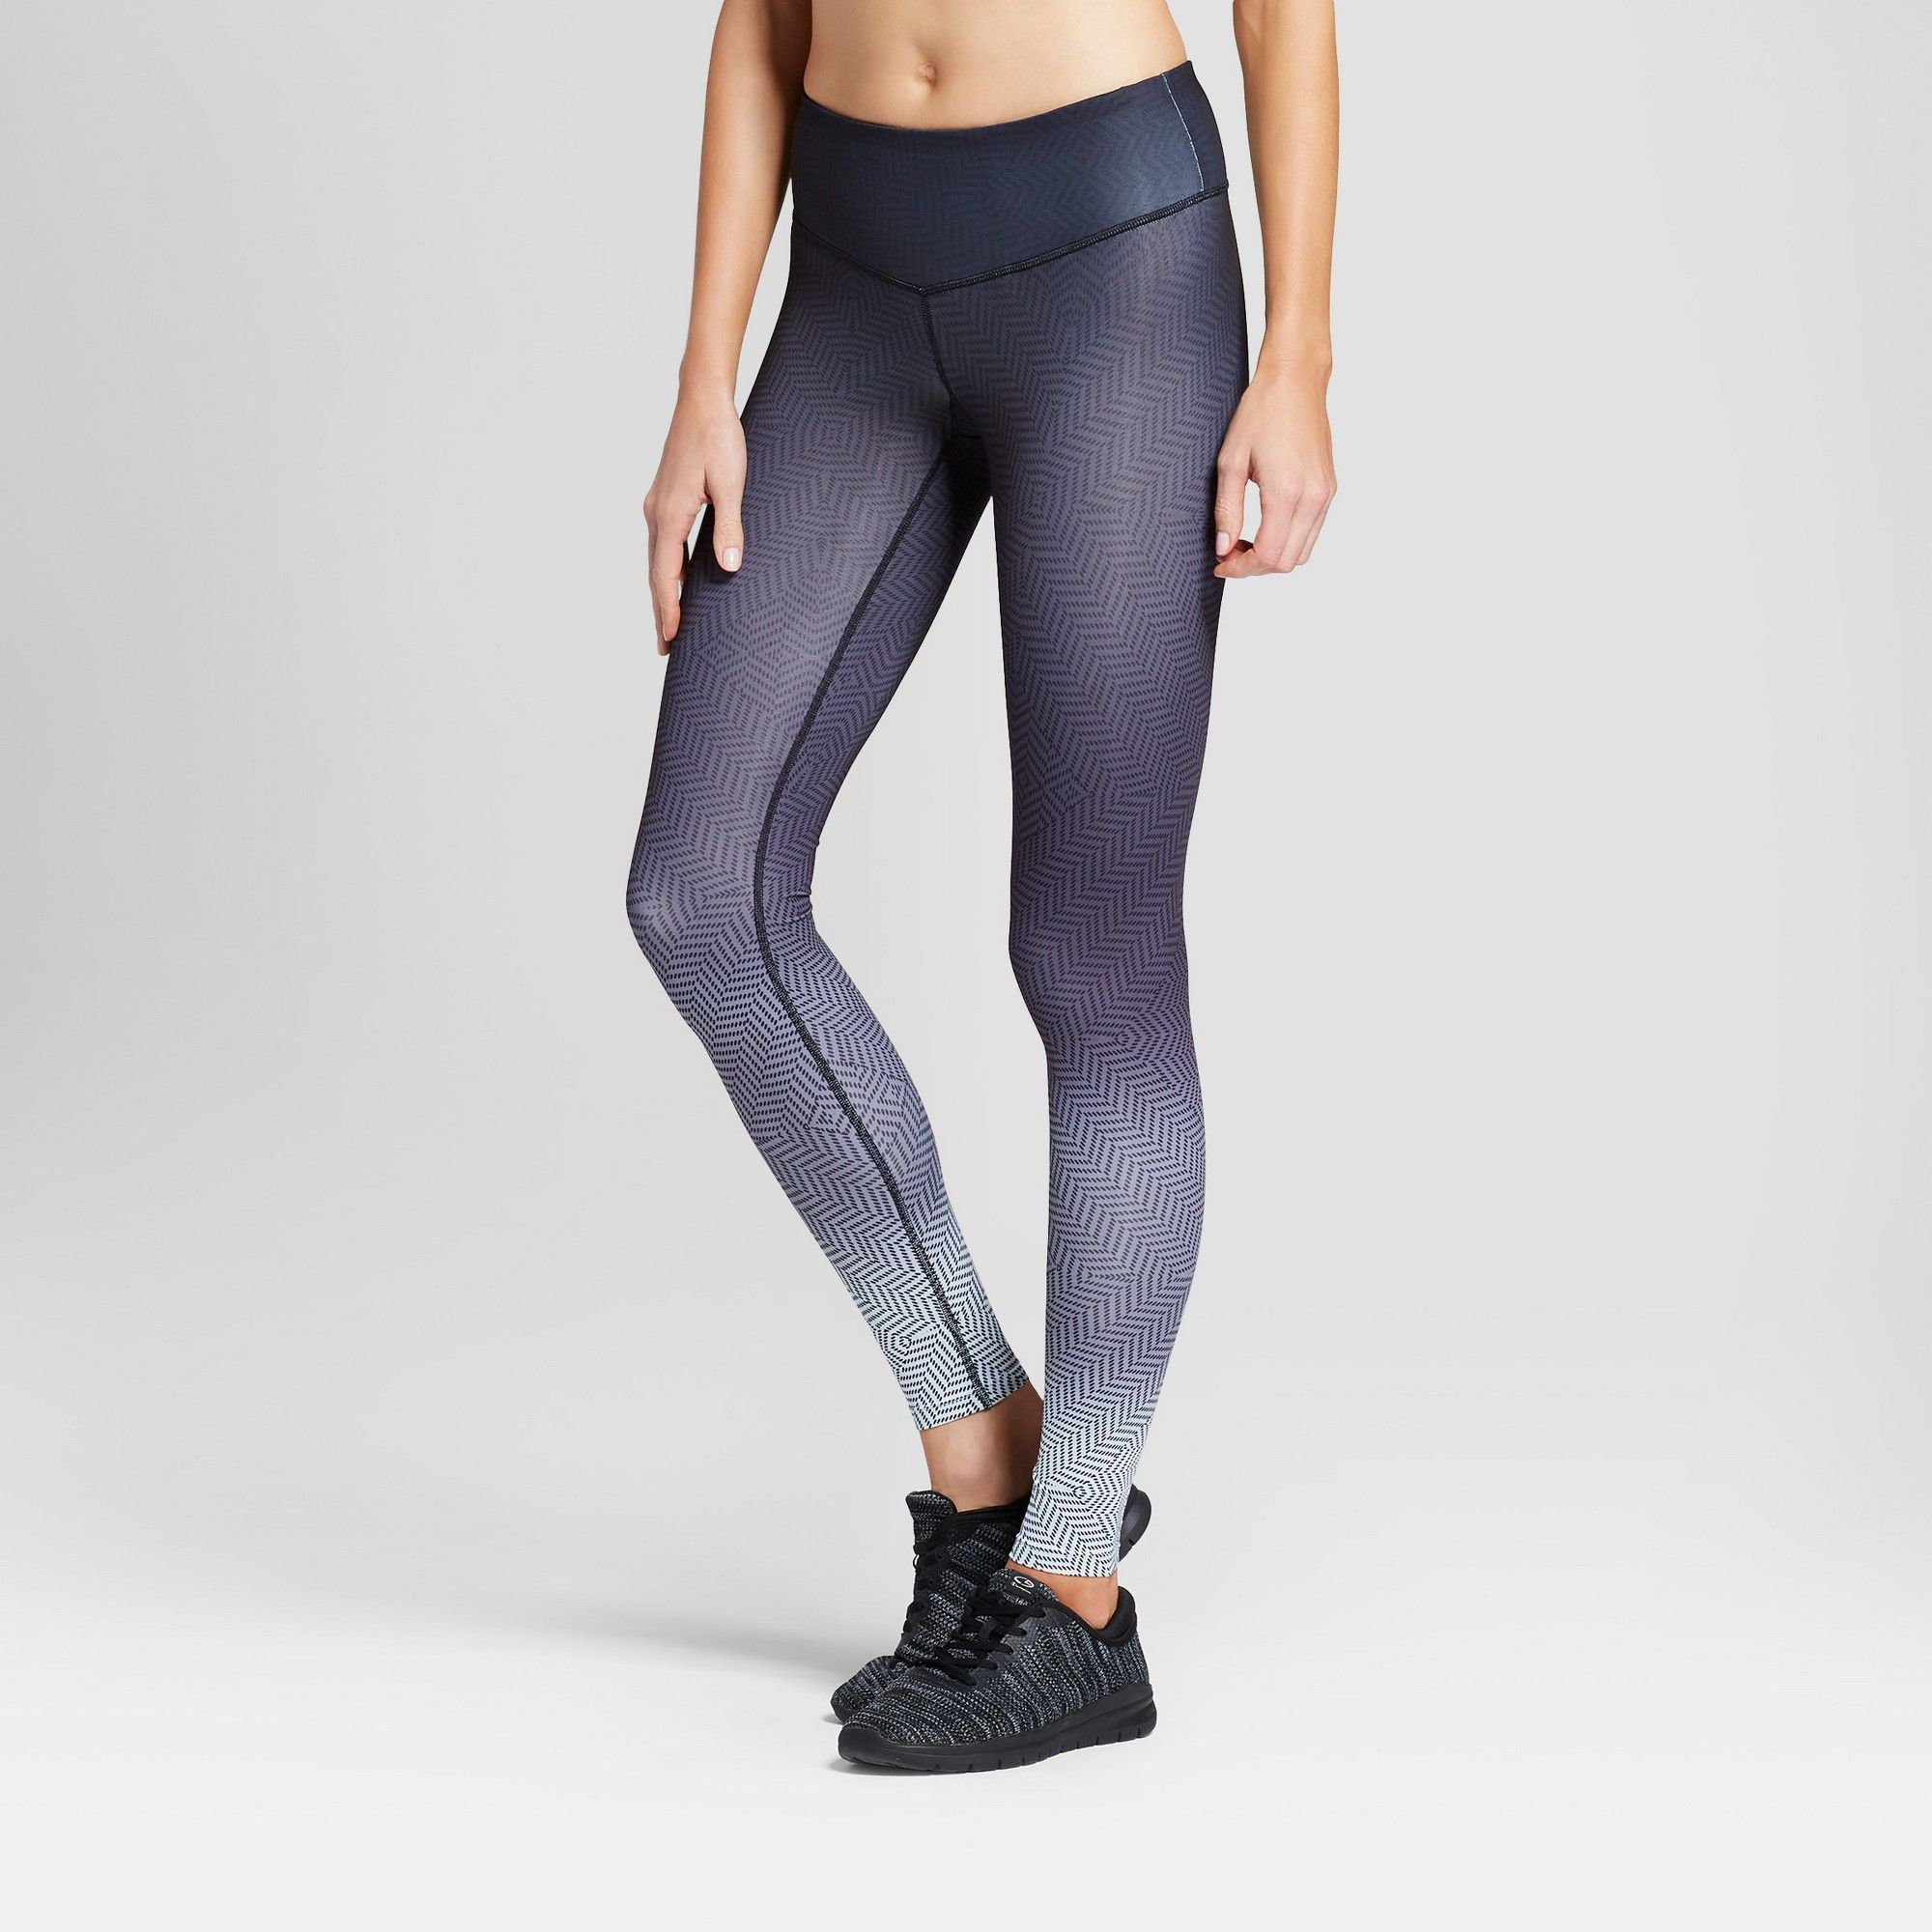 b5dc1c9e9dde Women s Embrace Geo Ombre Printed Leggings - C9 Champion Gray Xxl ...